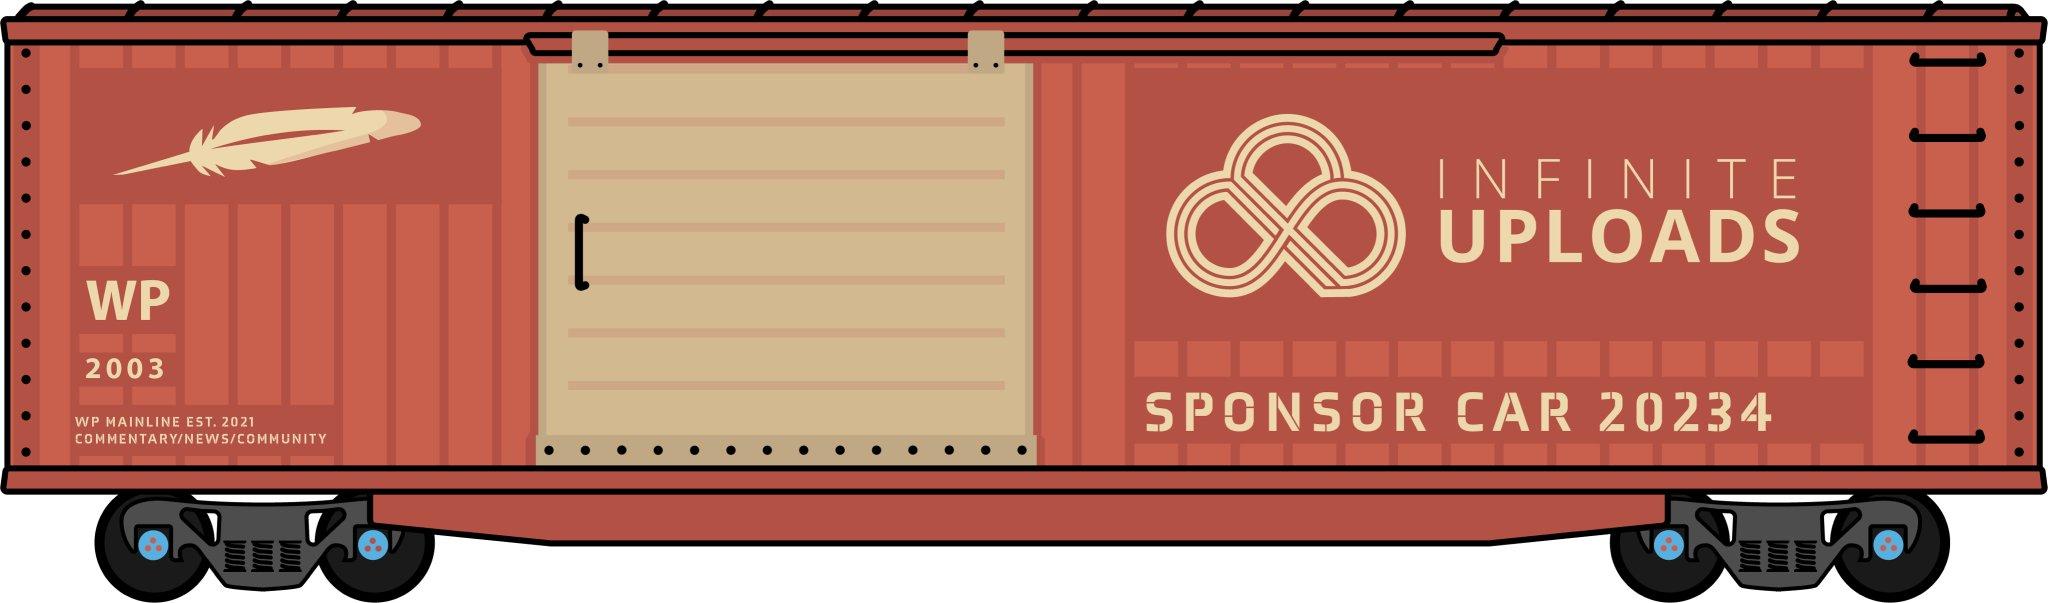 Sample Boxcar Design